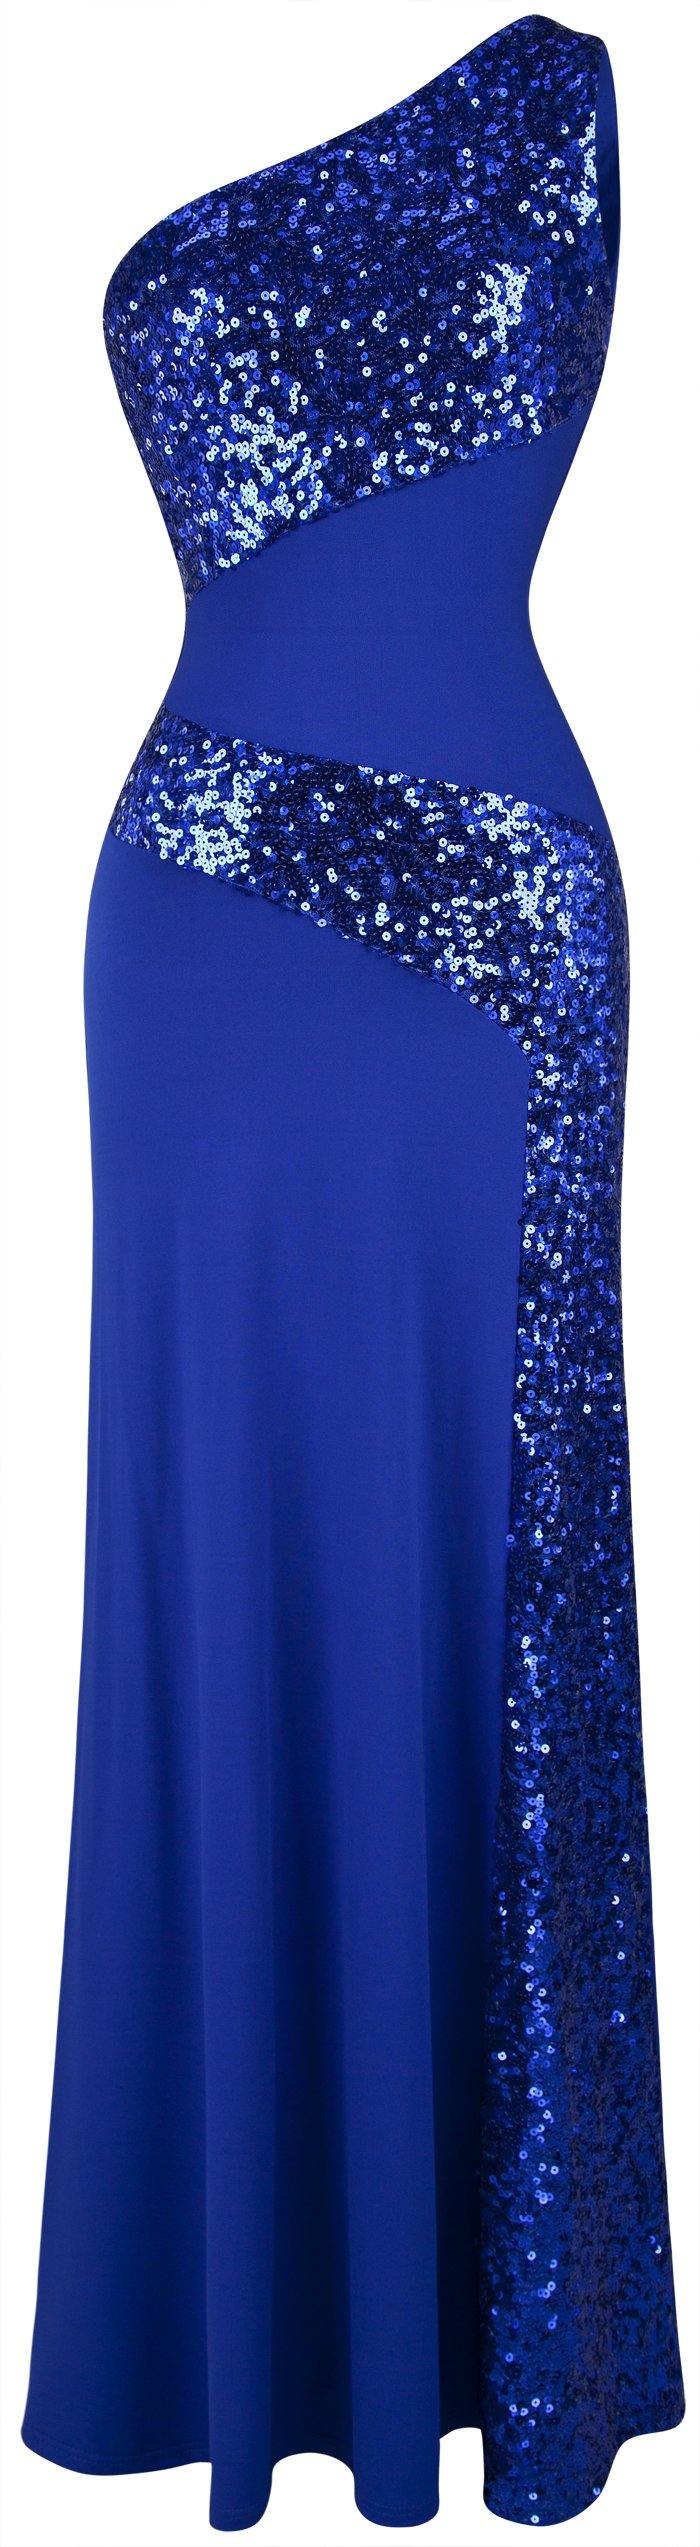 Angel-fashions Women's One Shoulder Sleeveless Sequin Maxi Prom Dresses Medium Blue